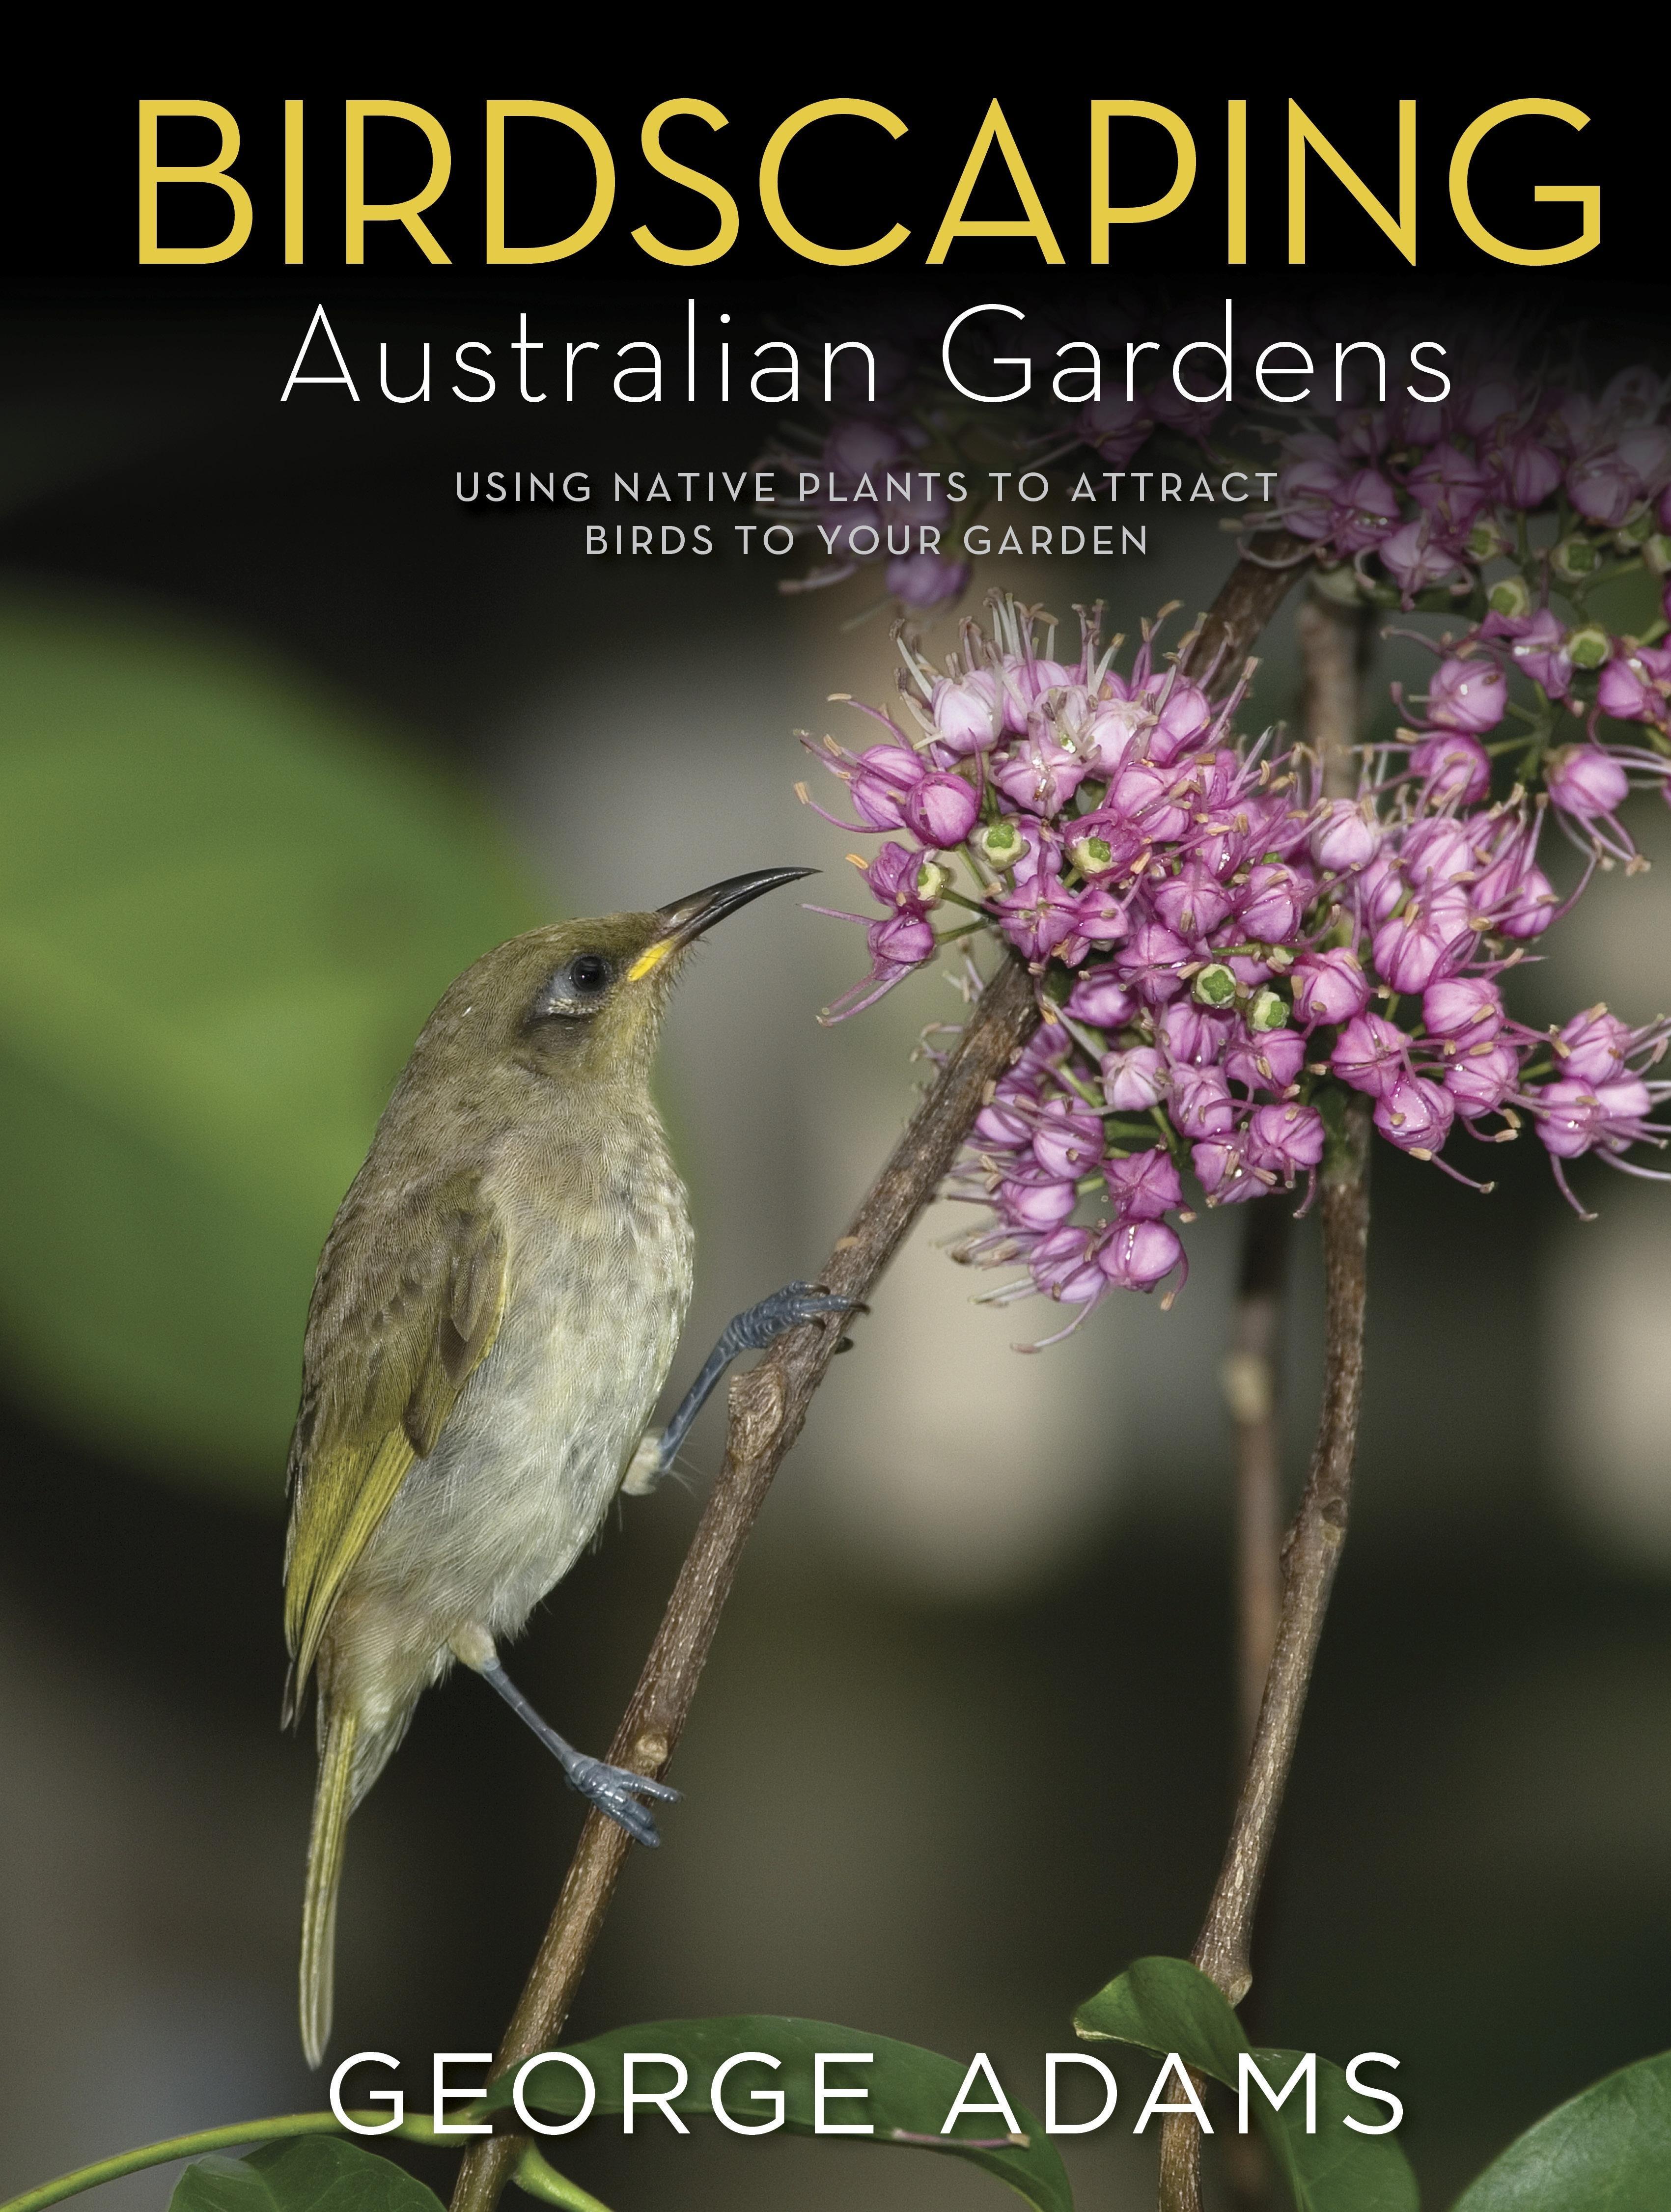 BirdscapingAustralianGardens